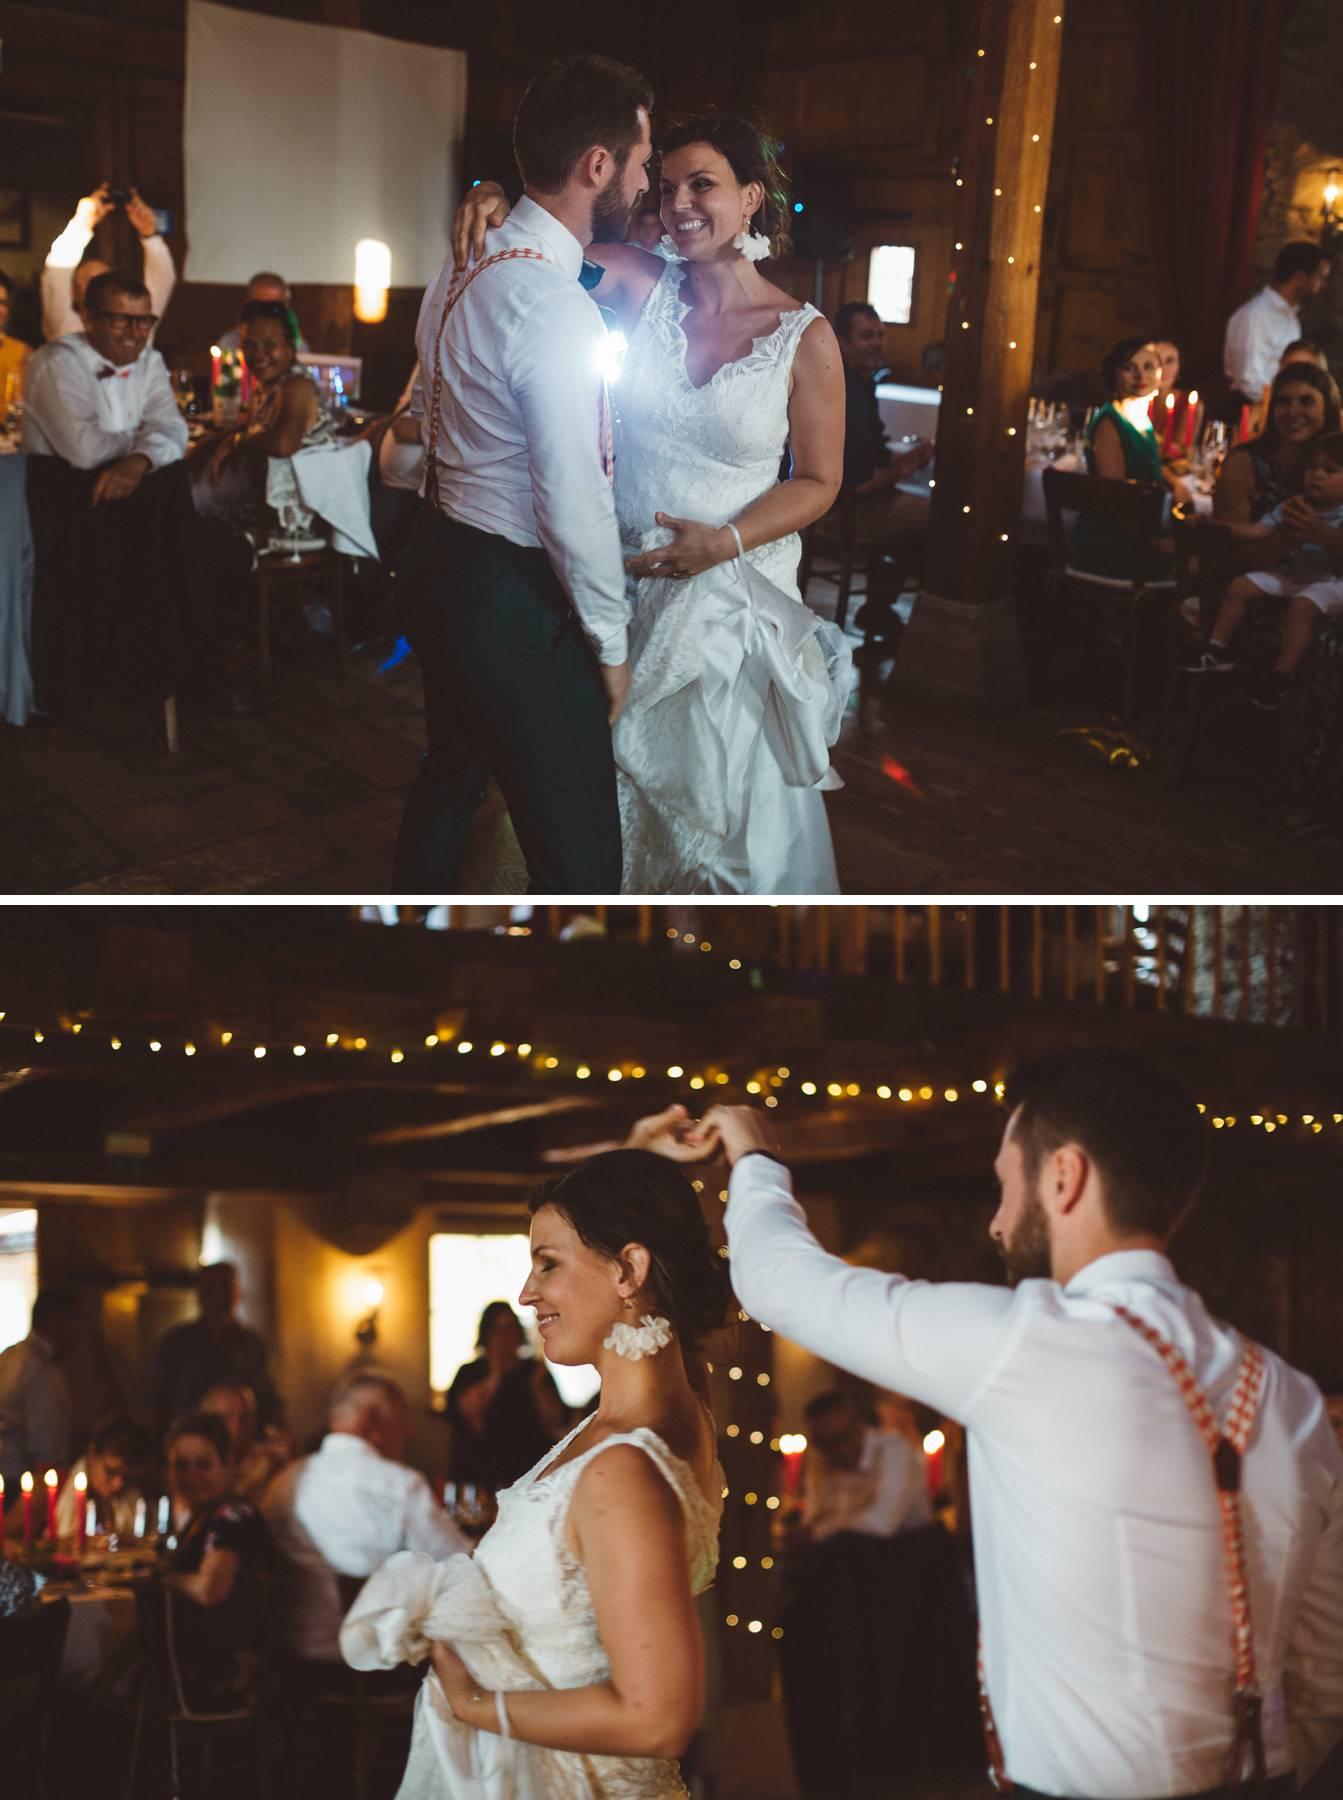 mariage-tropical-raben-horben_0029.jpg